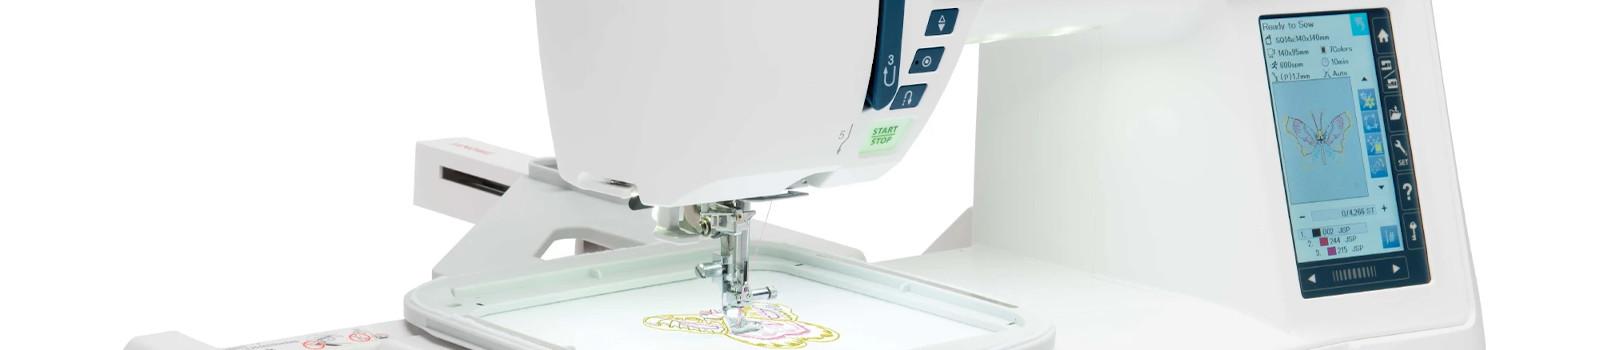 Janome Skyline S9 Embroidery Machine